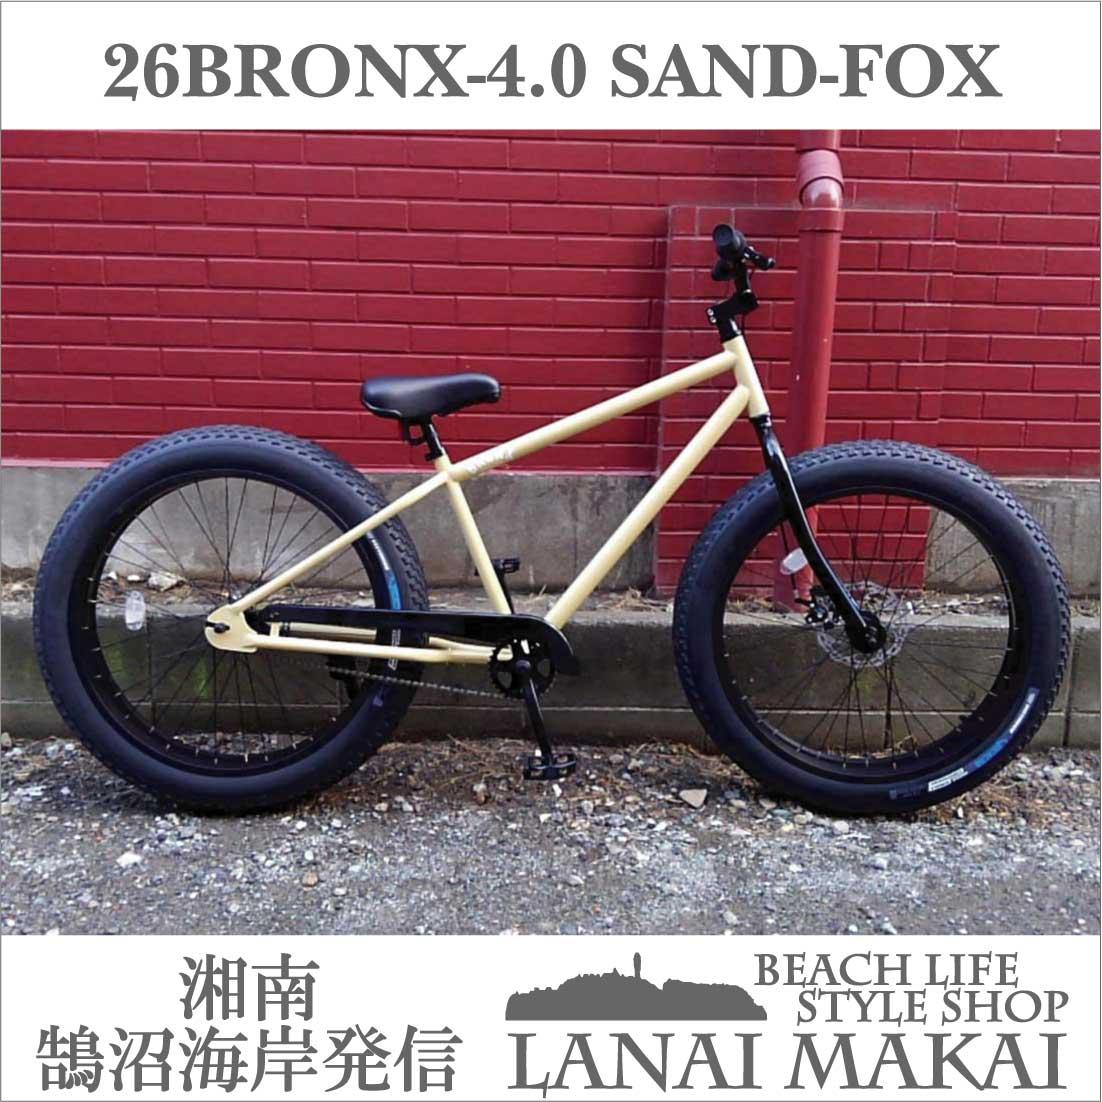 "【MODEL】""26BRONX FAT-BIKES""""湘南鵠沼海岸発信""《RAINBOW BRONX FAT-BIKES》COLOR:サンドフォックス自転車 ファットバイク メンズ レディース 26インチ レインボー BRONX"